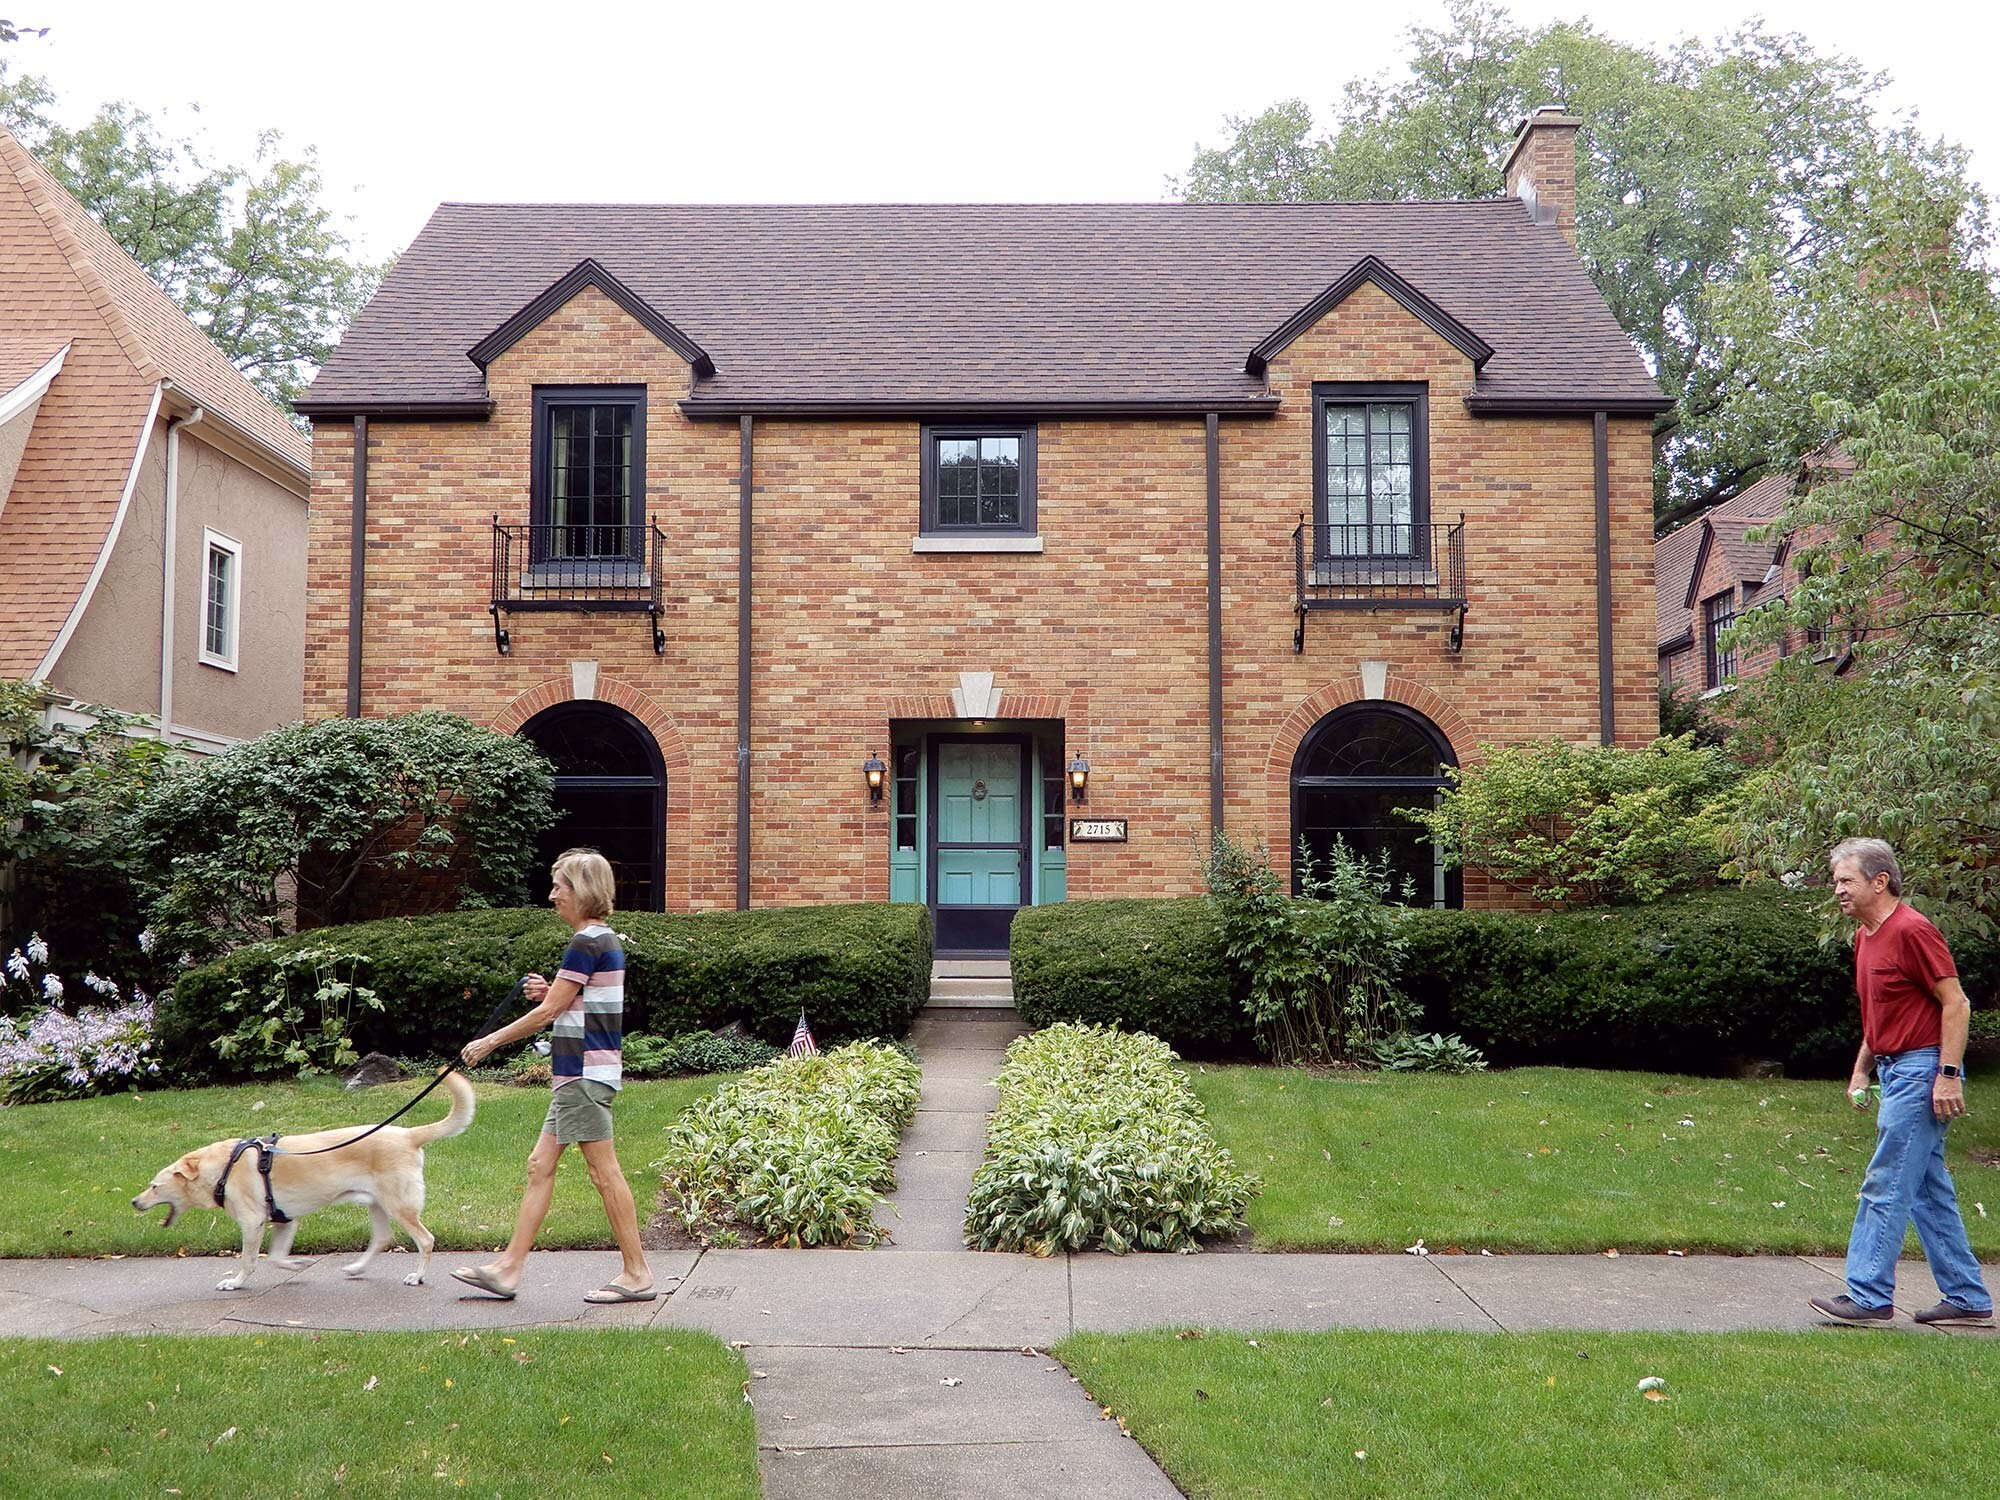 Bertha Y. Whitman-designed house at 2525 Payne Street, Evanston. Photo by Julia Bachrach.